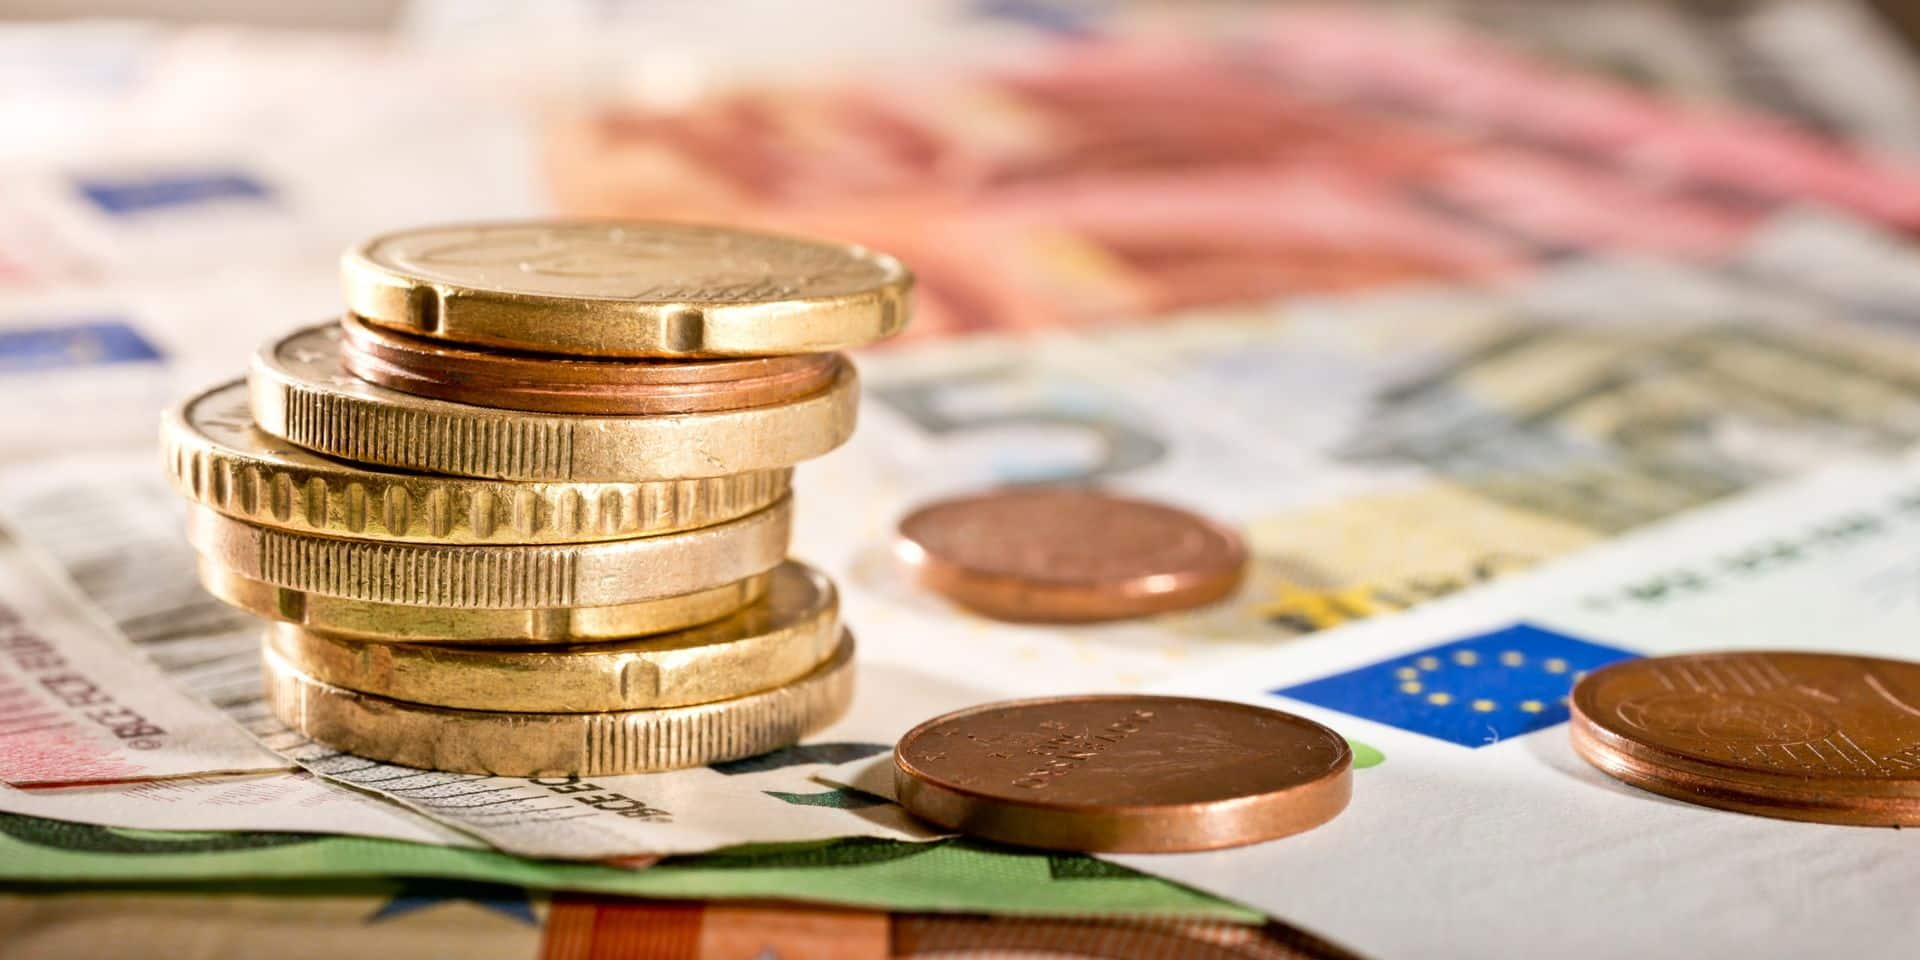 L'inflation grimpe à 1,23 % en avril